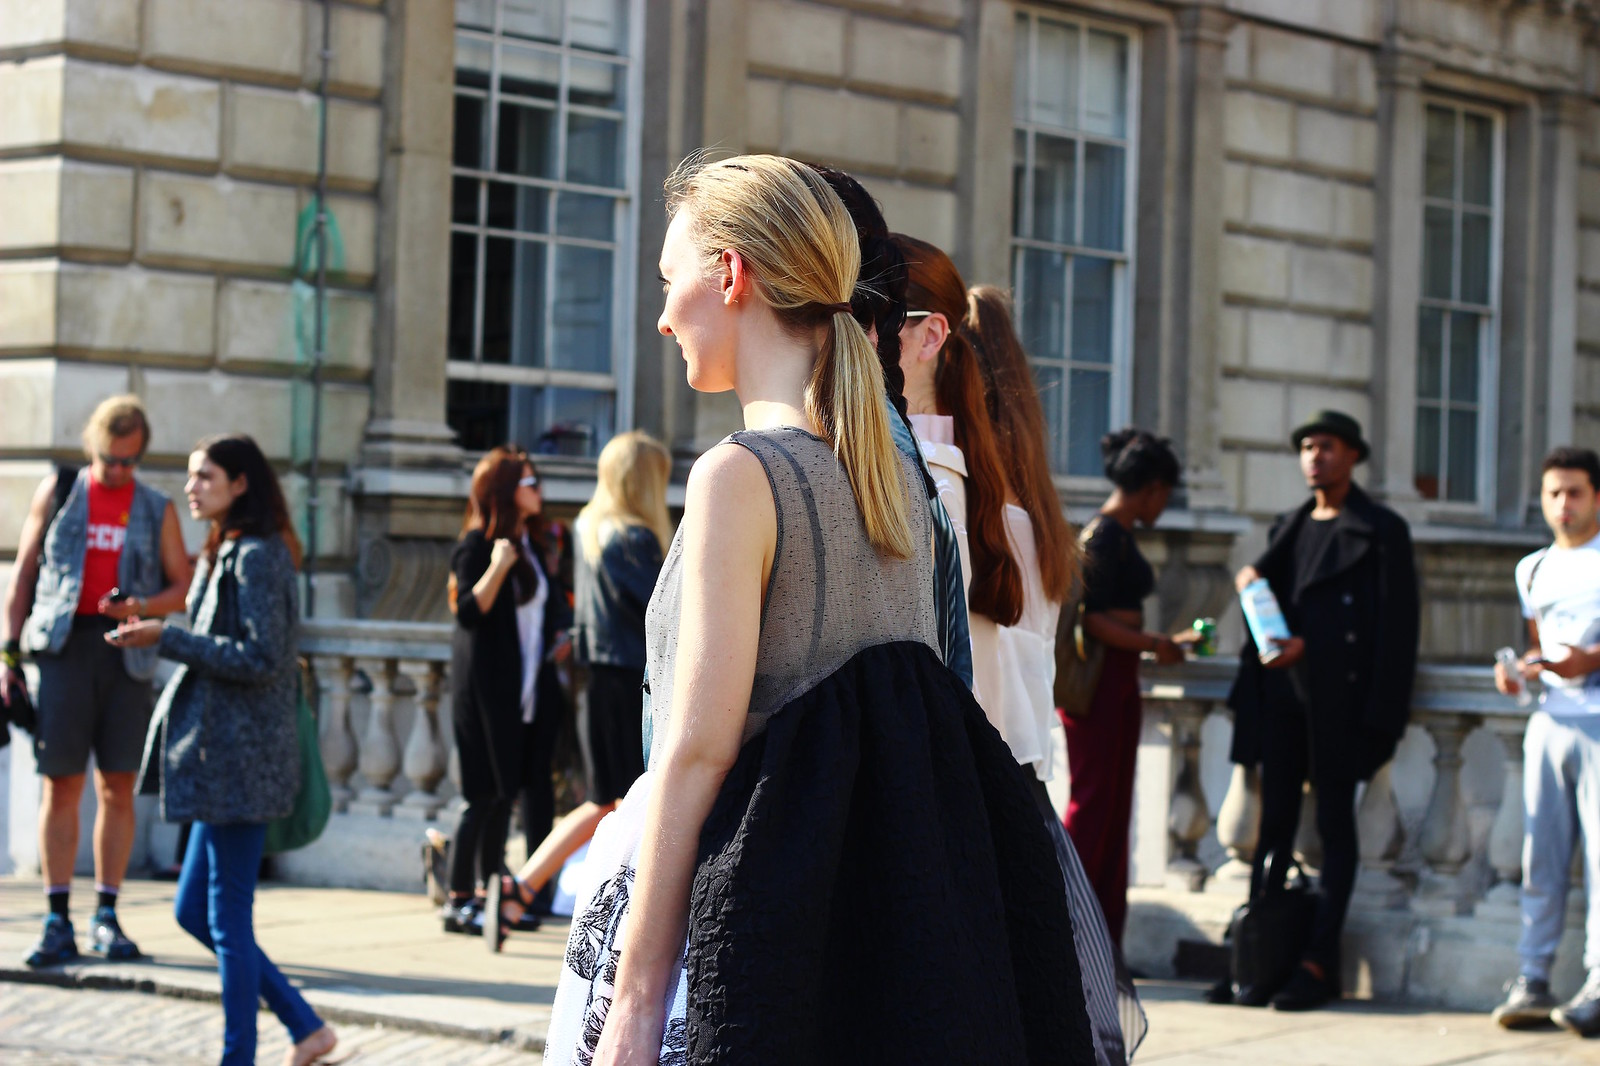 5lfw, londonfashionweek, streetstyle, photography